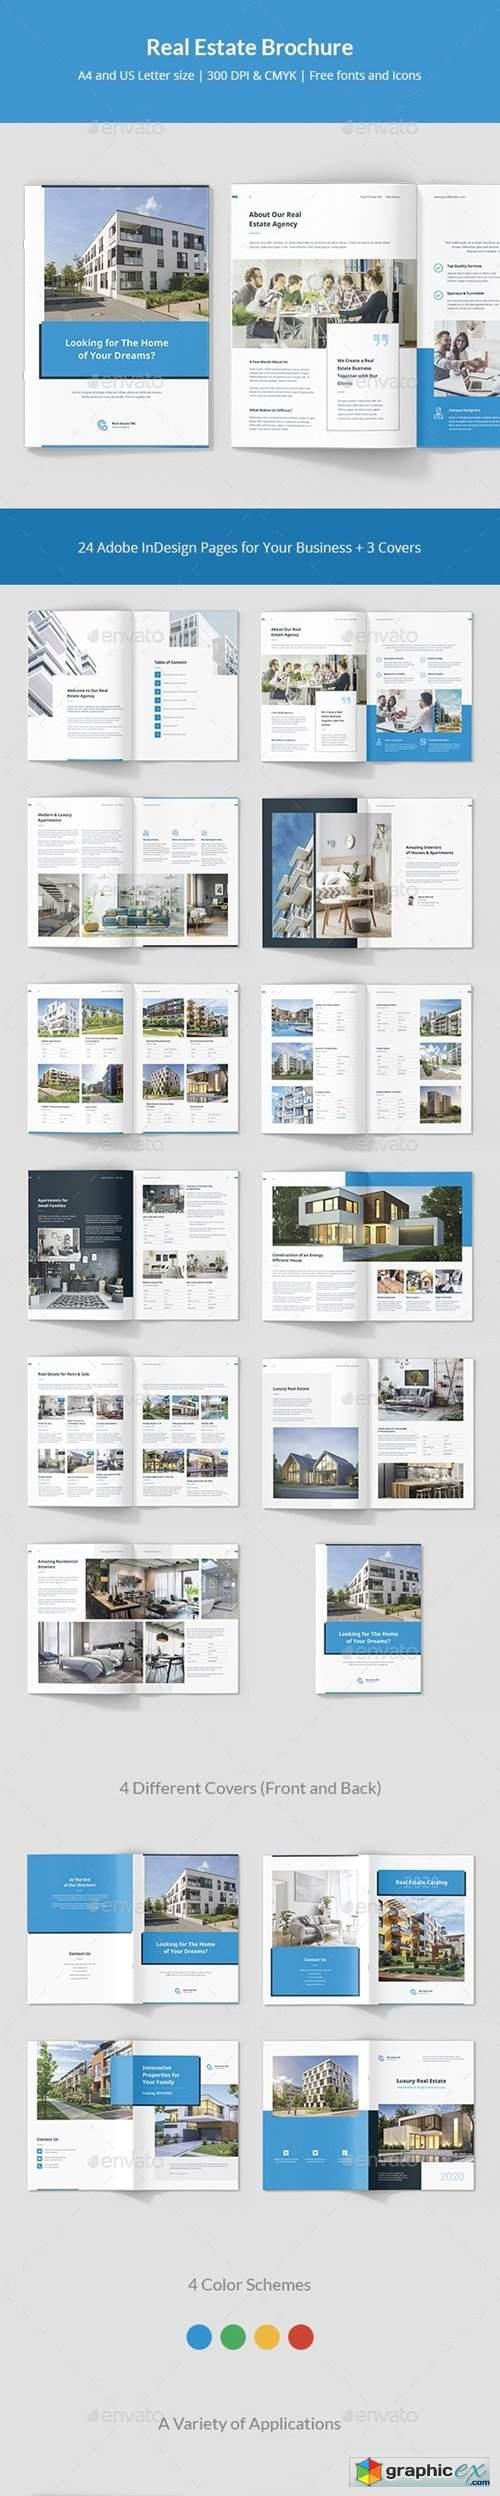 Real Estate Brochure 25370225